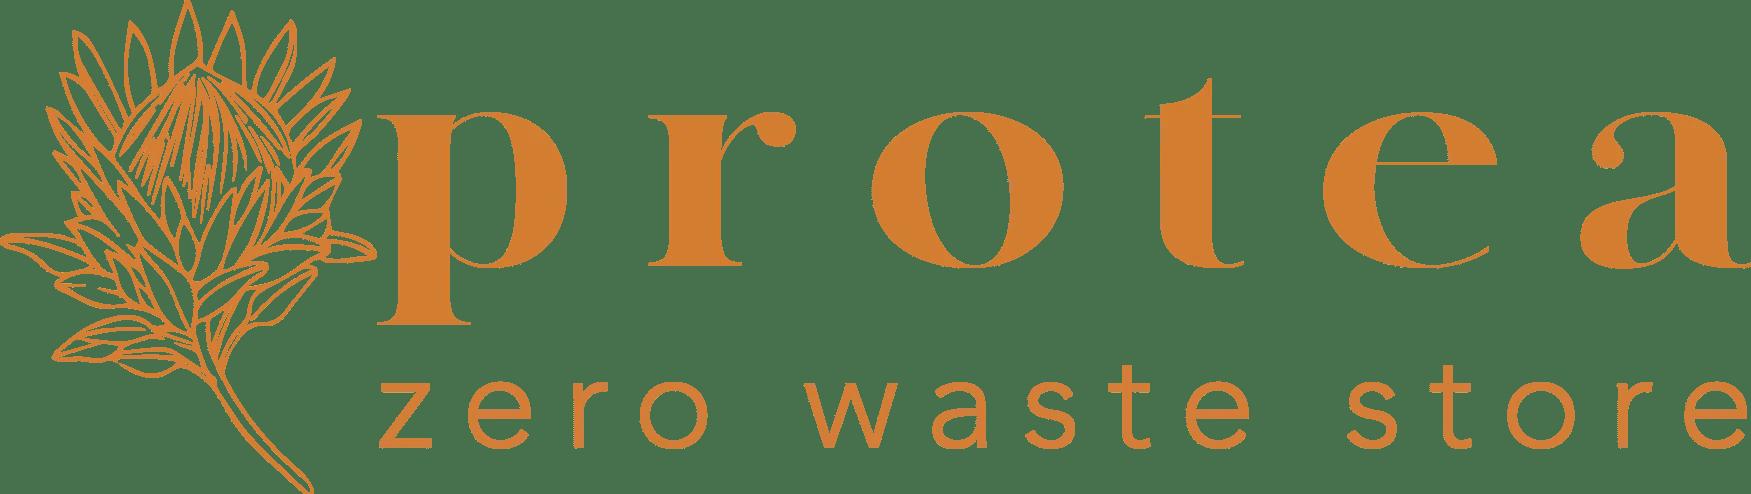 Protea Zero Waste